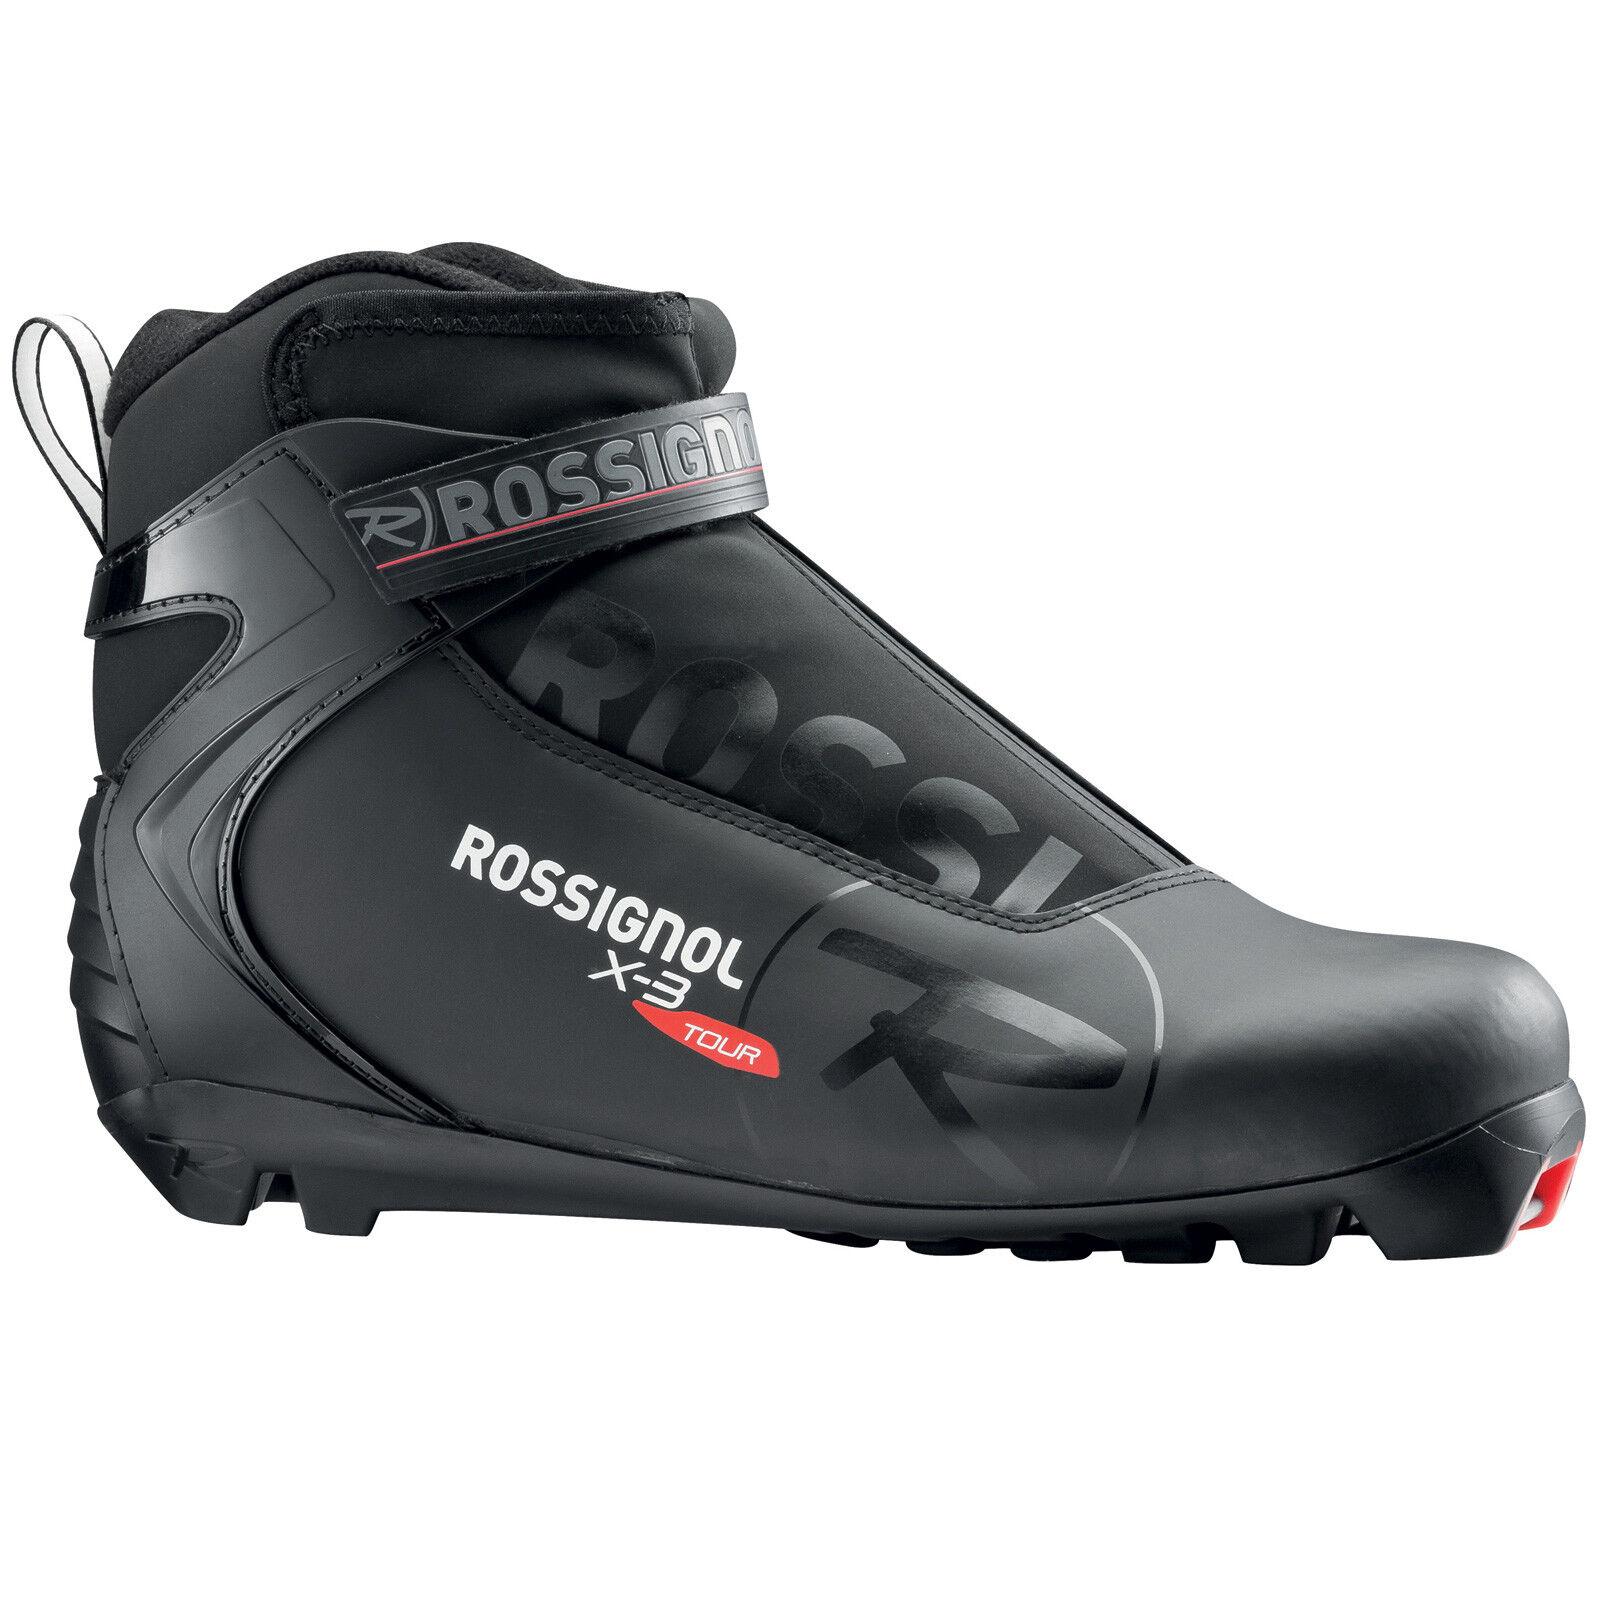 Rossignol X-3 Unisex Unisex Unisex Langlaufschuhe Classic Stil Touring Skischuhe Ski-Stiefel NEU 7739c9